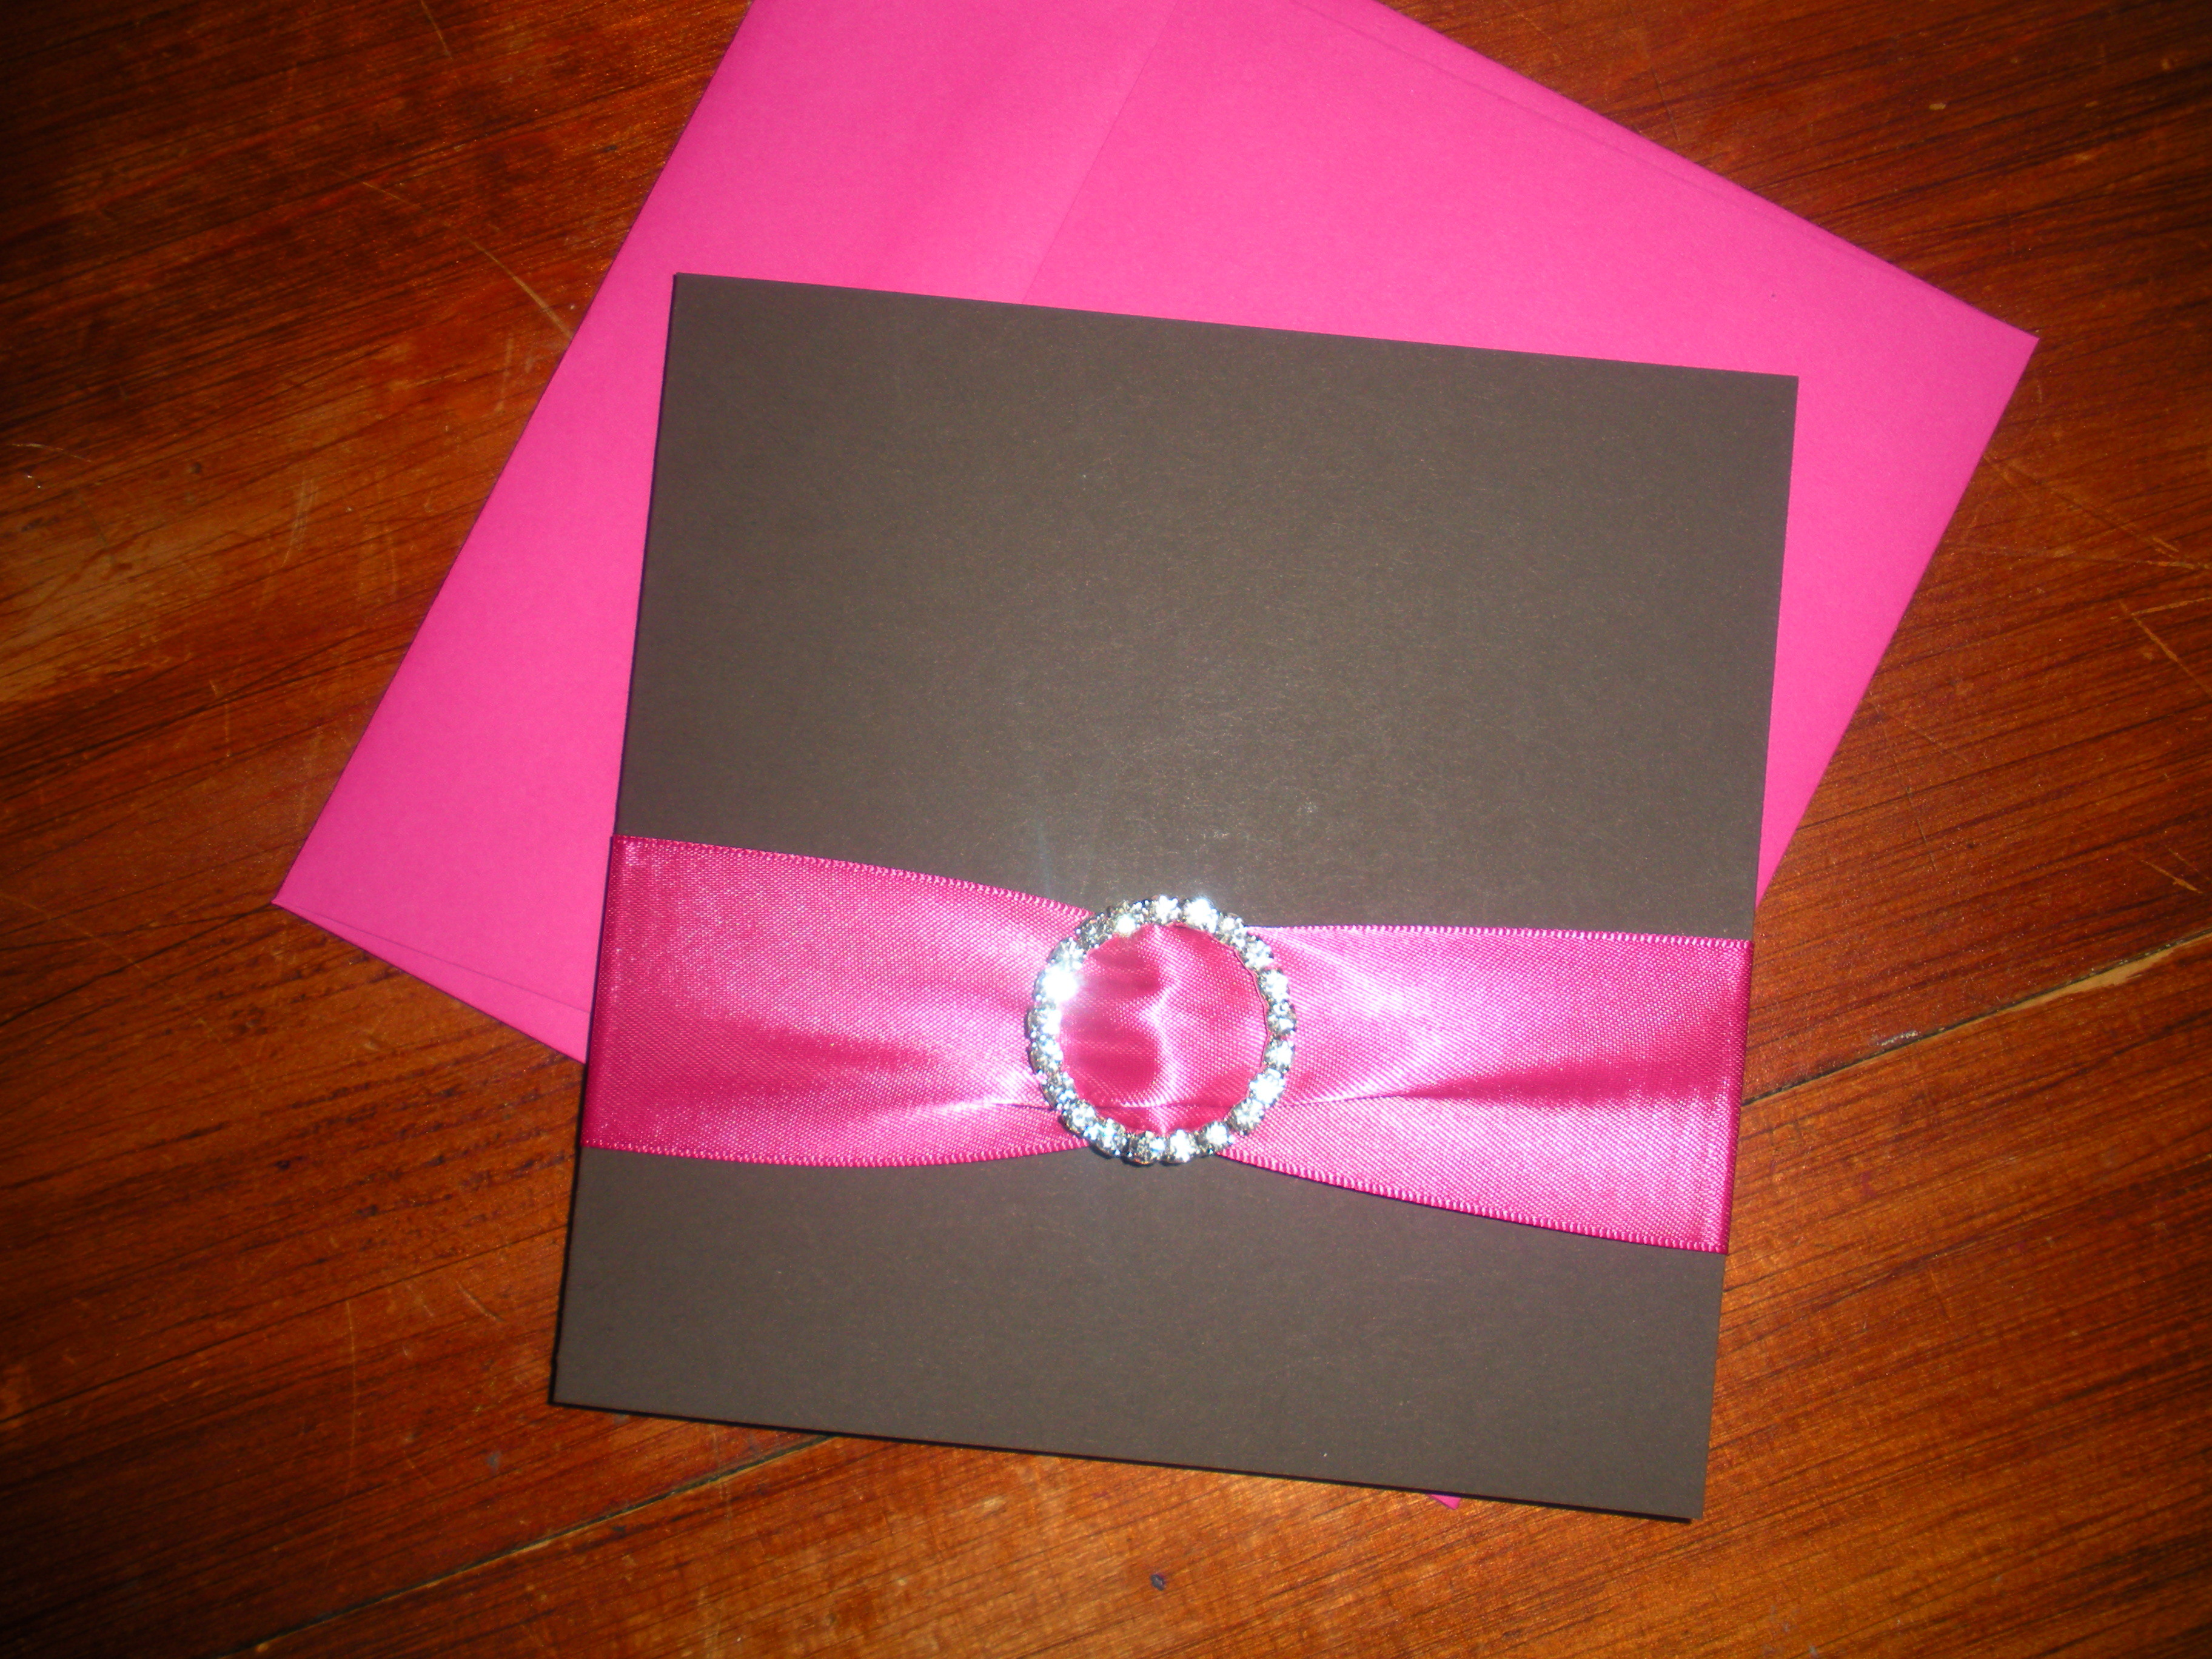 Stationery, invitation, Invitations, Pocketfold, Rhinestone, Buckle, Brandy nicole weddings